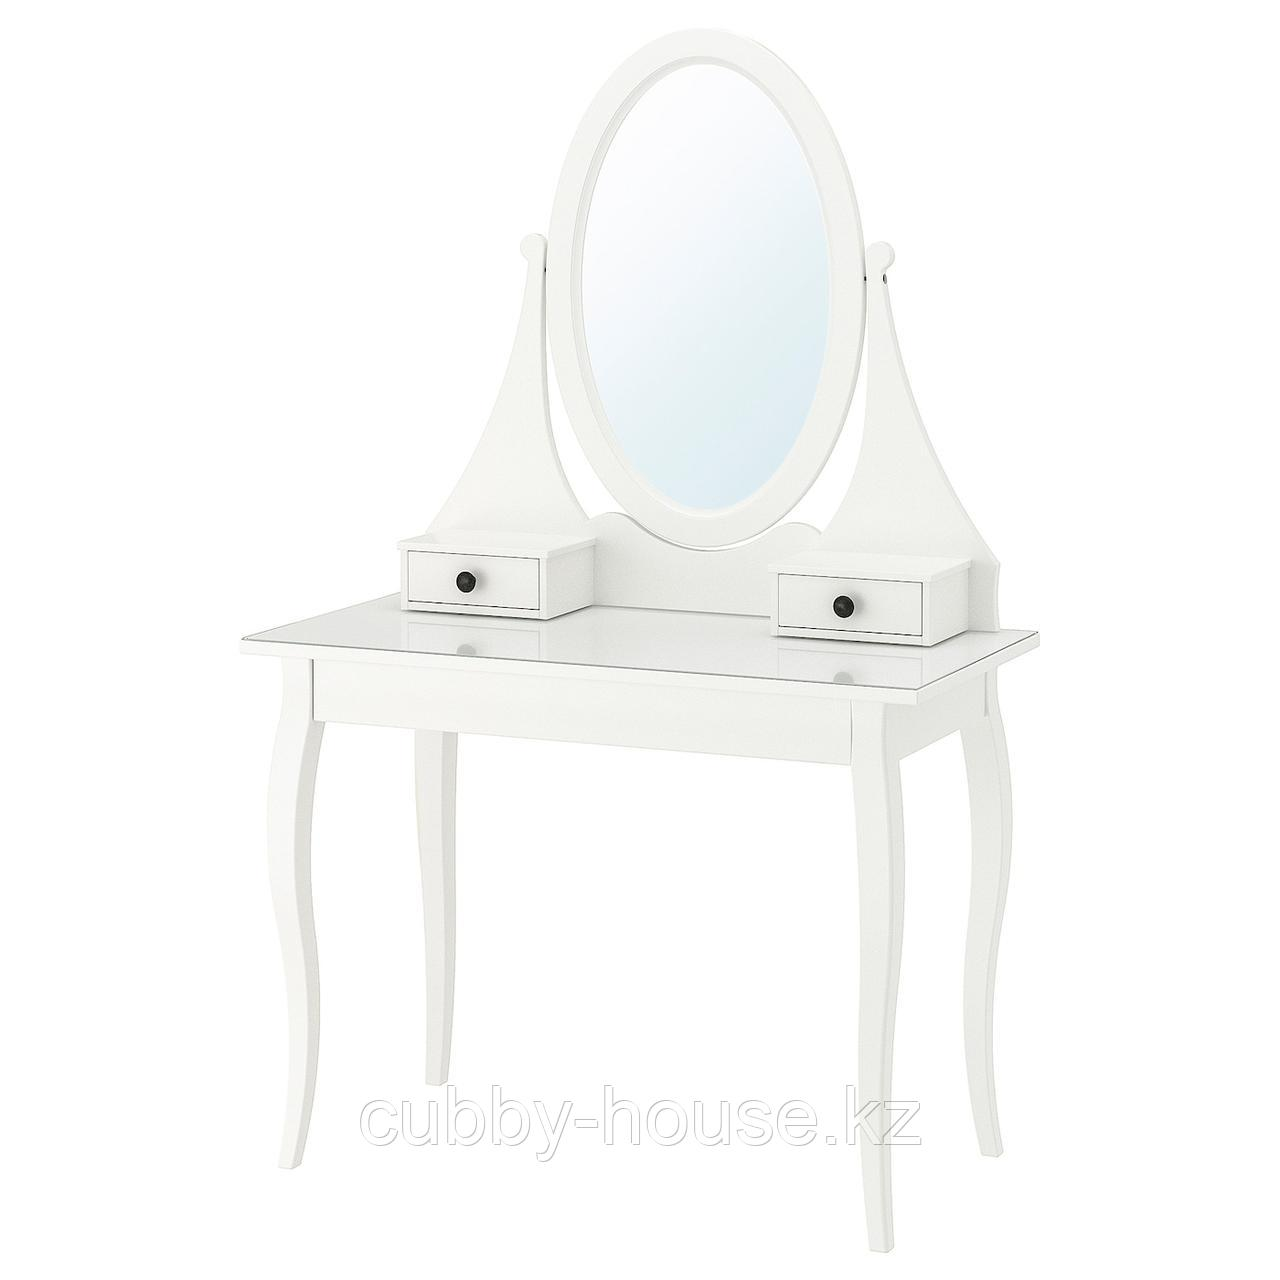 ХЕМНЭС Туалетный столик с зркл, белый, 100x50 см